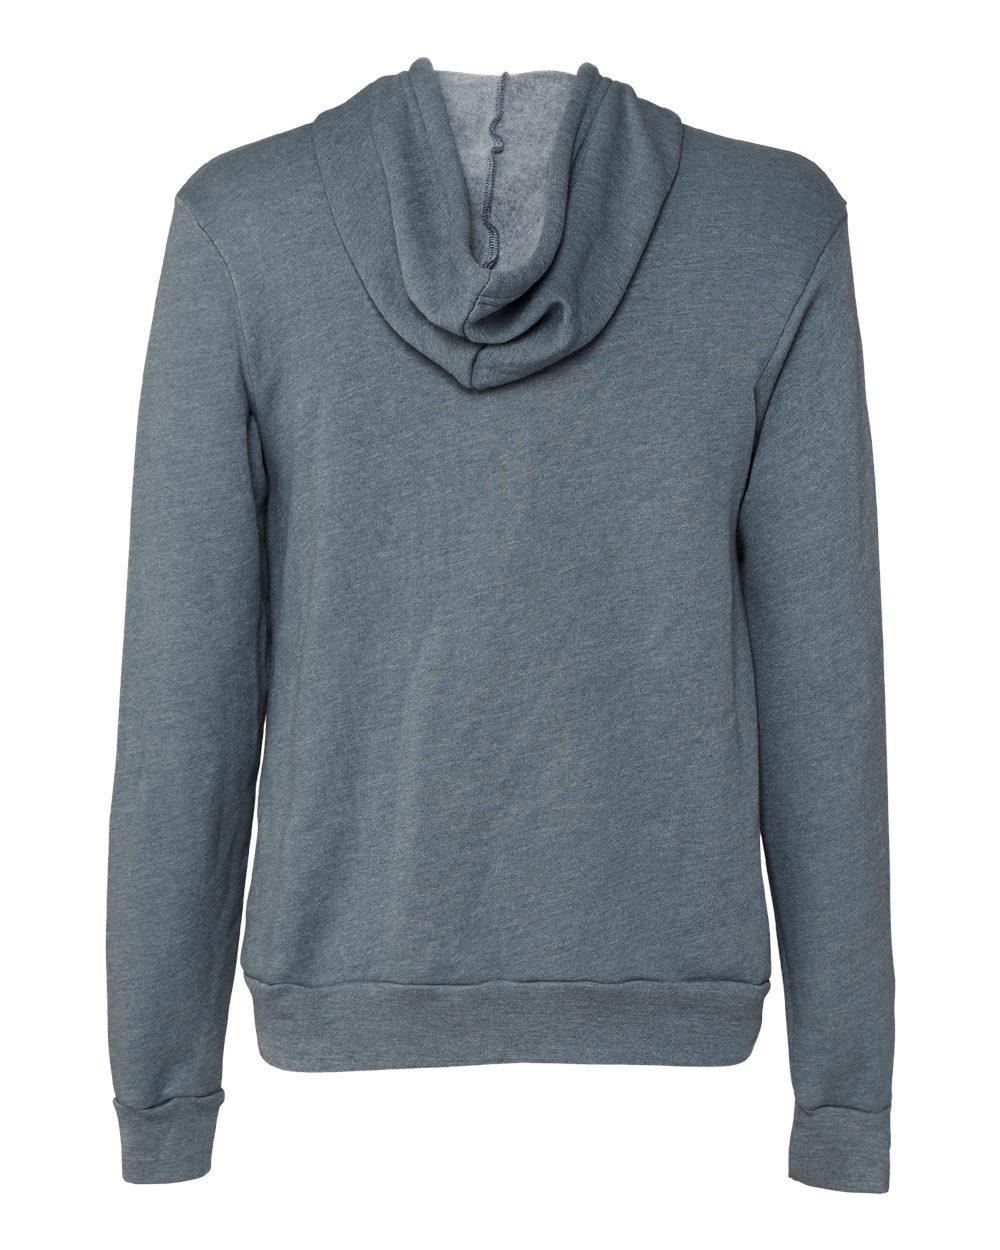 Bella-Canvas-Unisex-Full-Zip-Up-Hooded-Sweatshirt-Blank-Hoodie-3739-up-to-3XL thumbnail 55